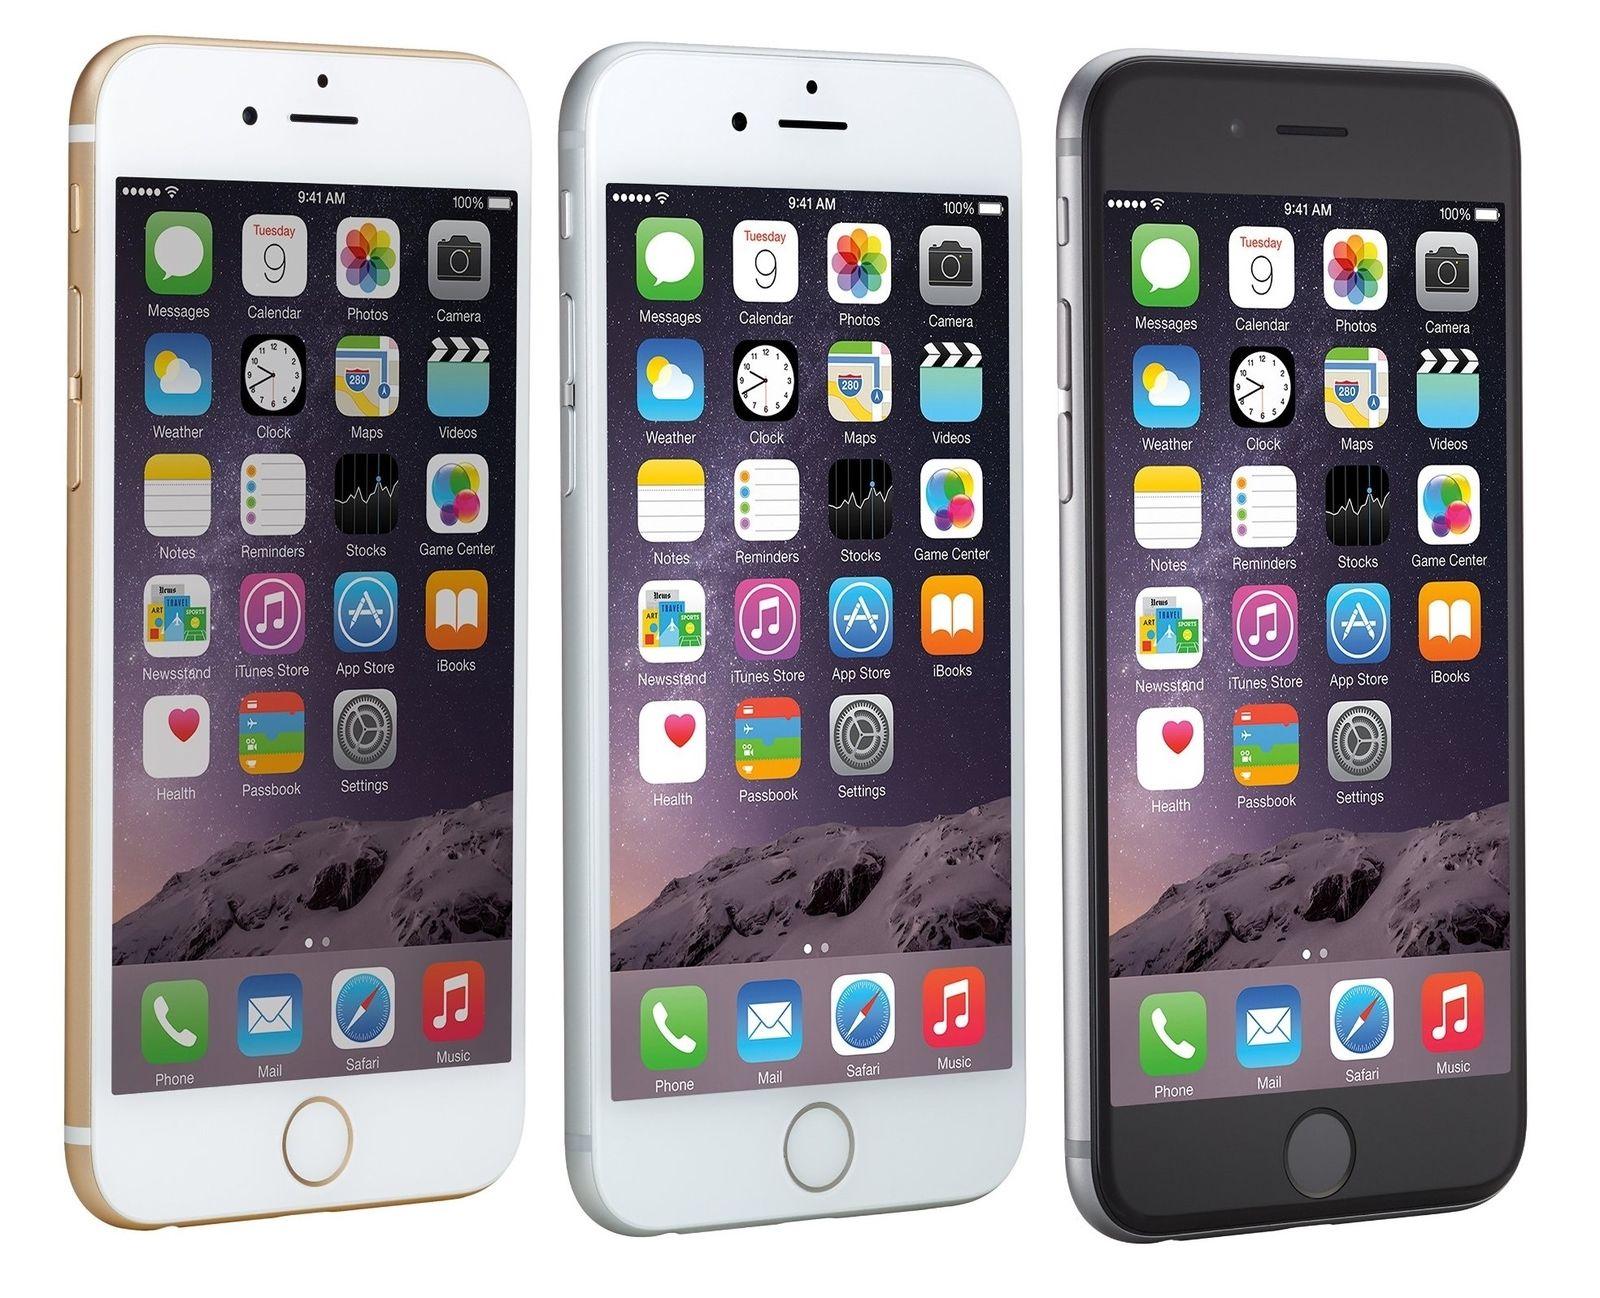 Apple Iphone 6 64gb At T T Mobile Metro Pcs Factory Gsm Unlocked Smartphone Ebay